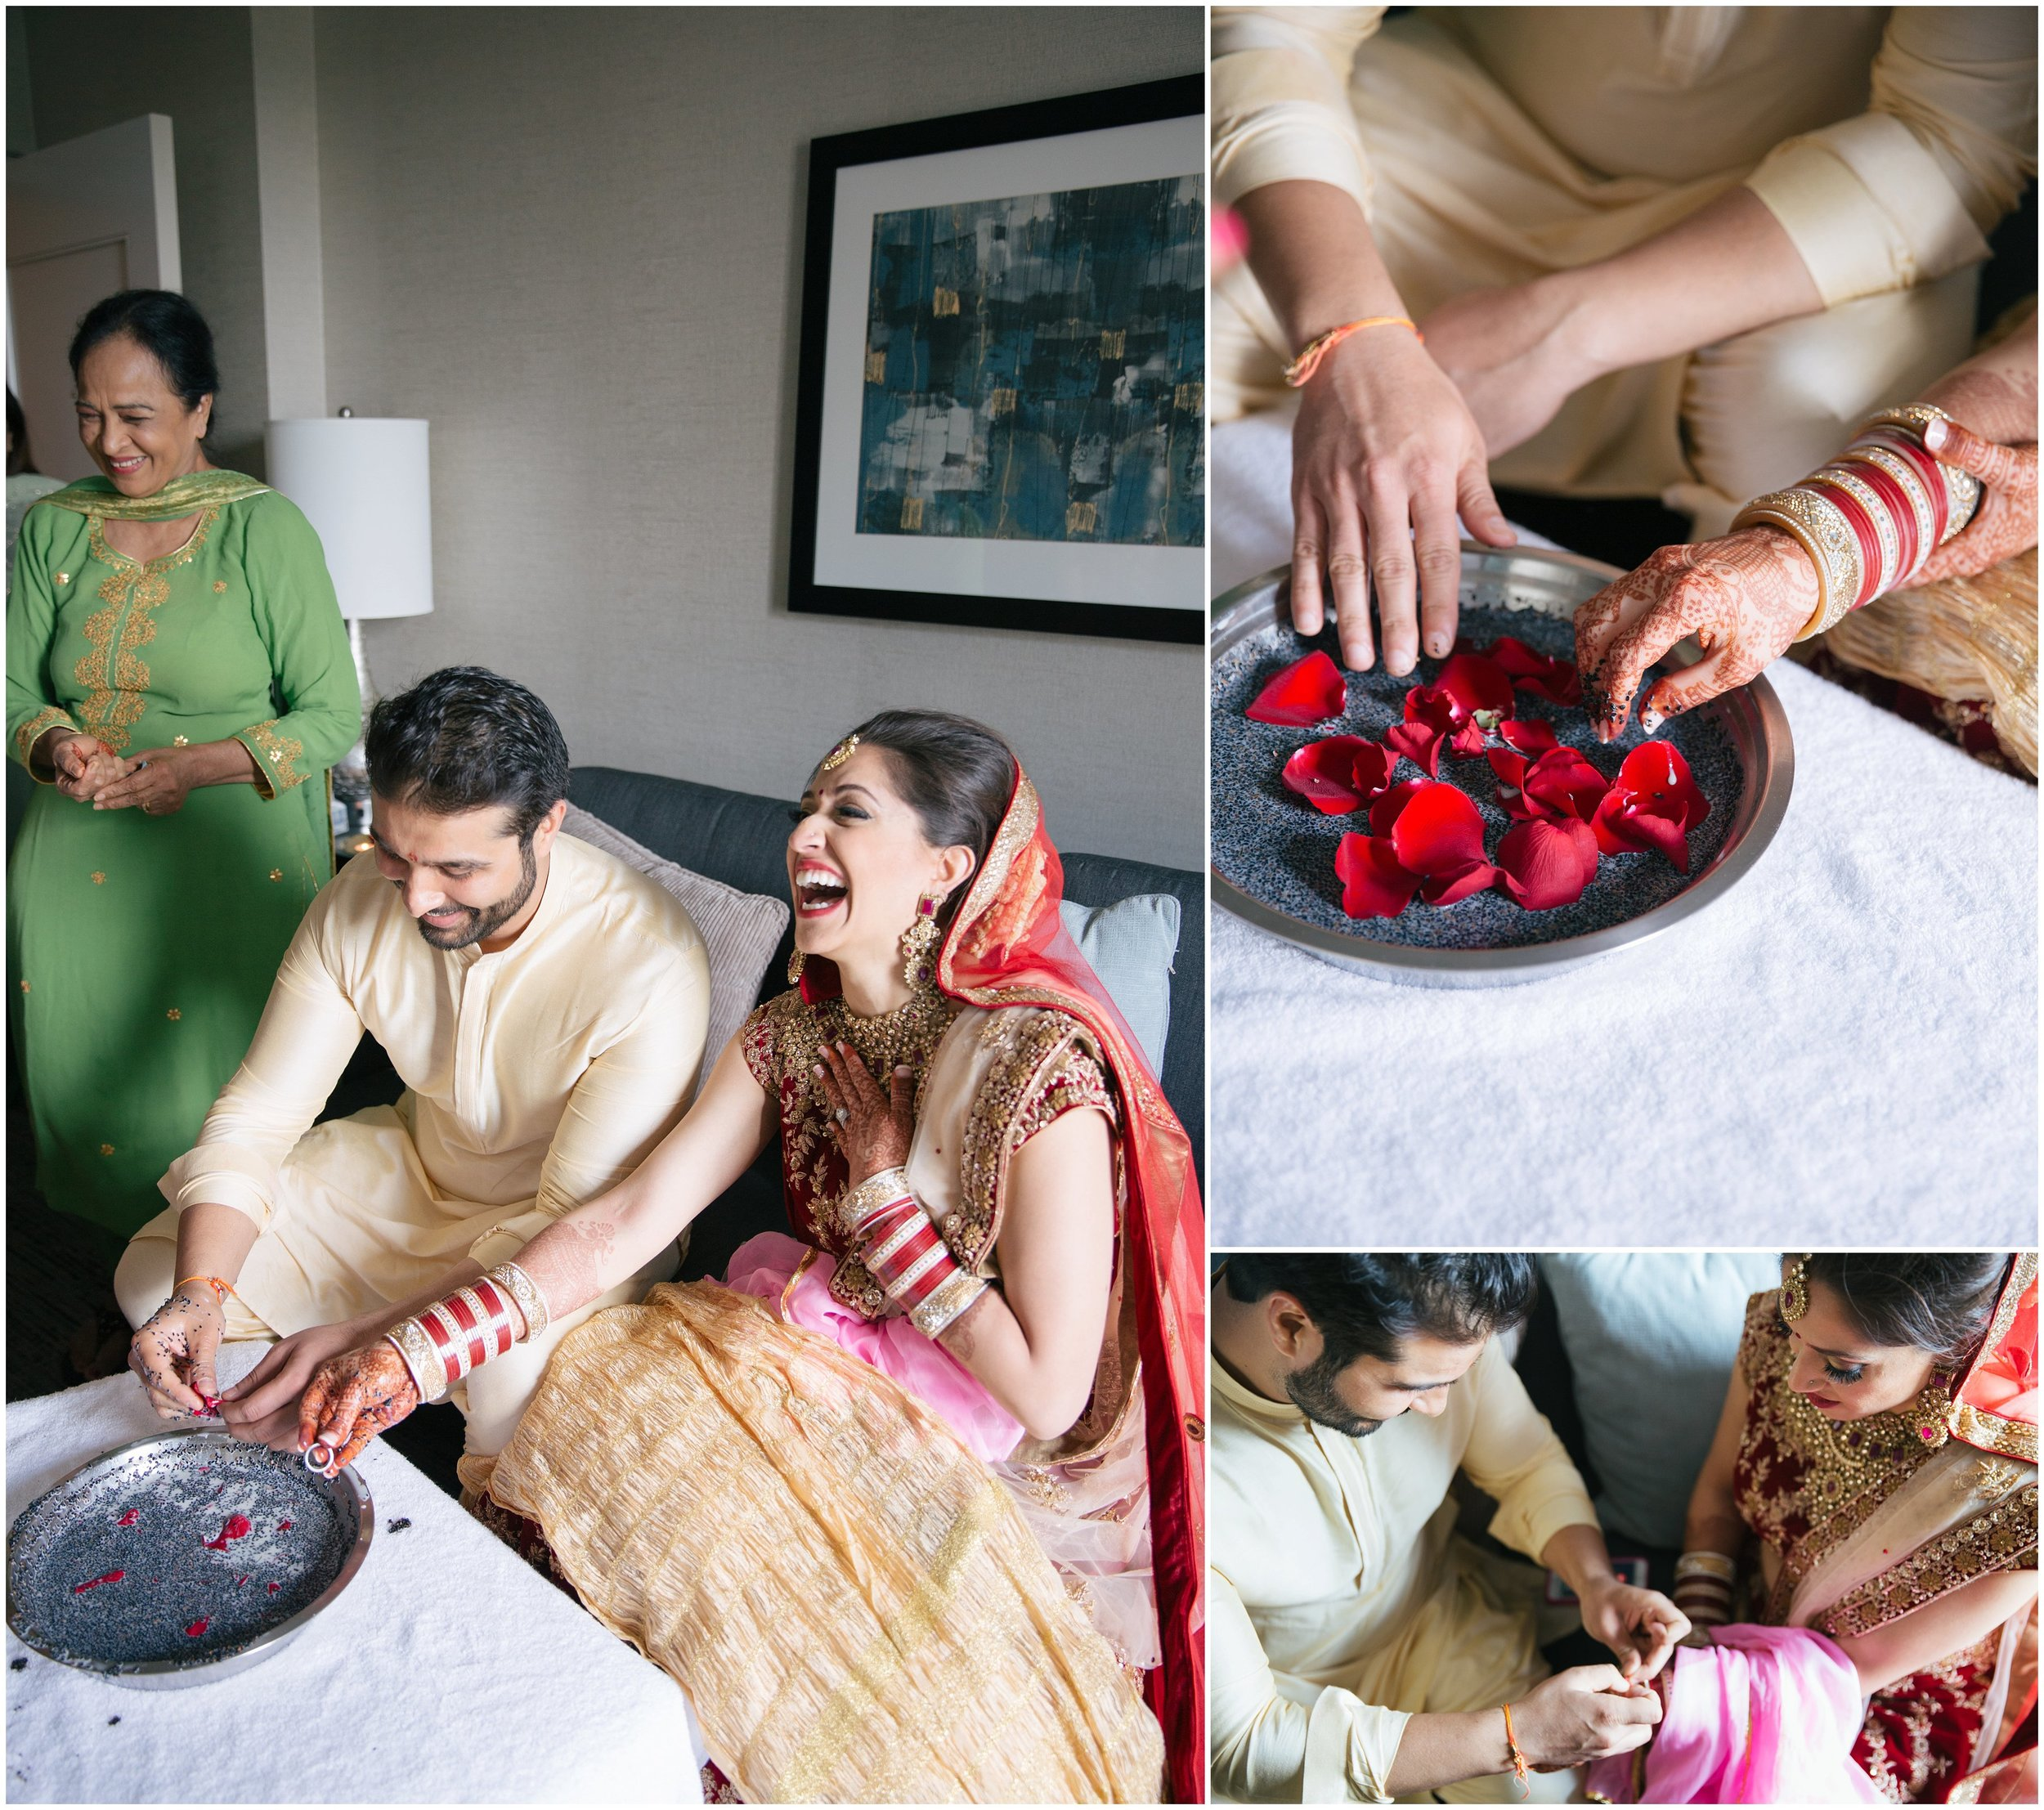 Le Cape Weddings - South Asian Wedding in Illinois - Tanvi and Anshul -0998_LuxuryDestinationPhotographer.jpg